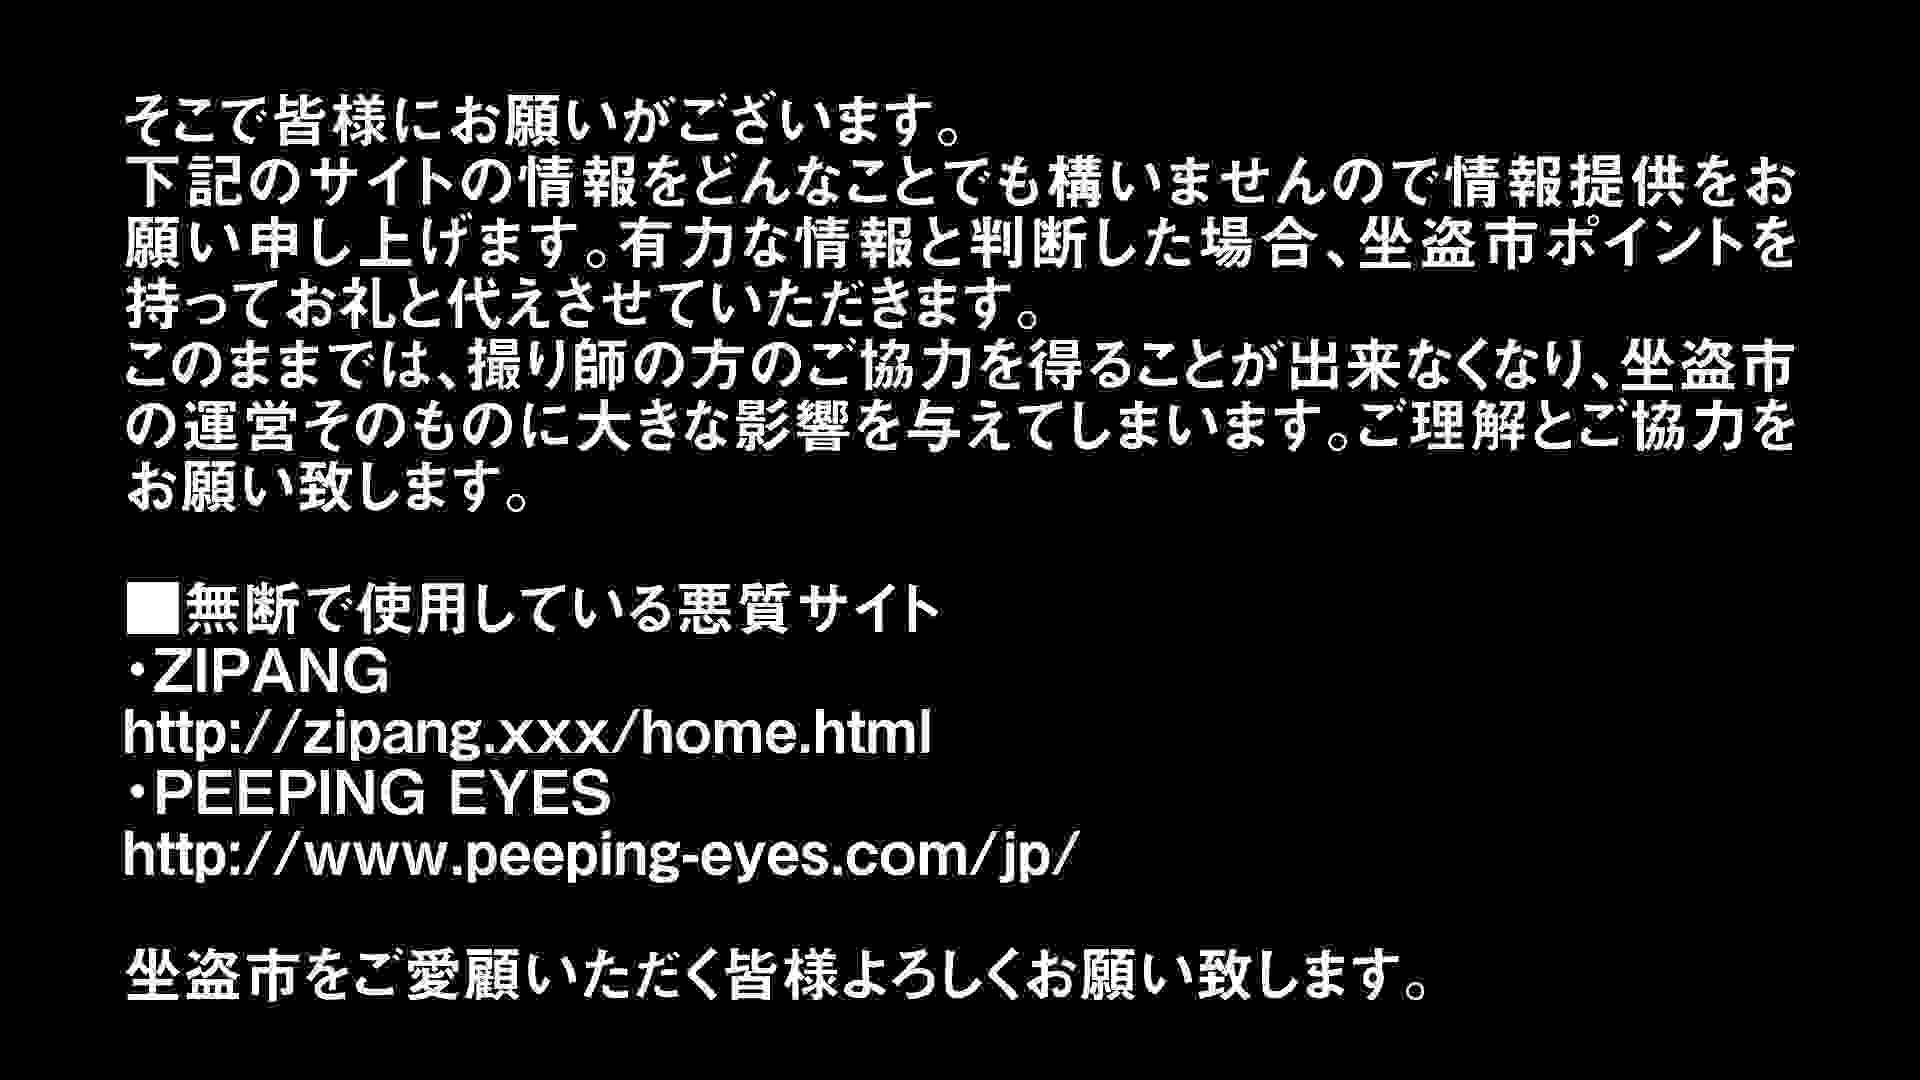 Aquaな露天風呂Vol.301 OLセックス 隠し撮りすけべAV動画紹介 85画像 23